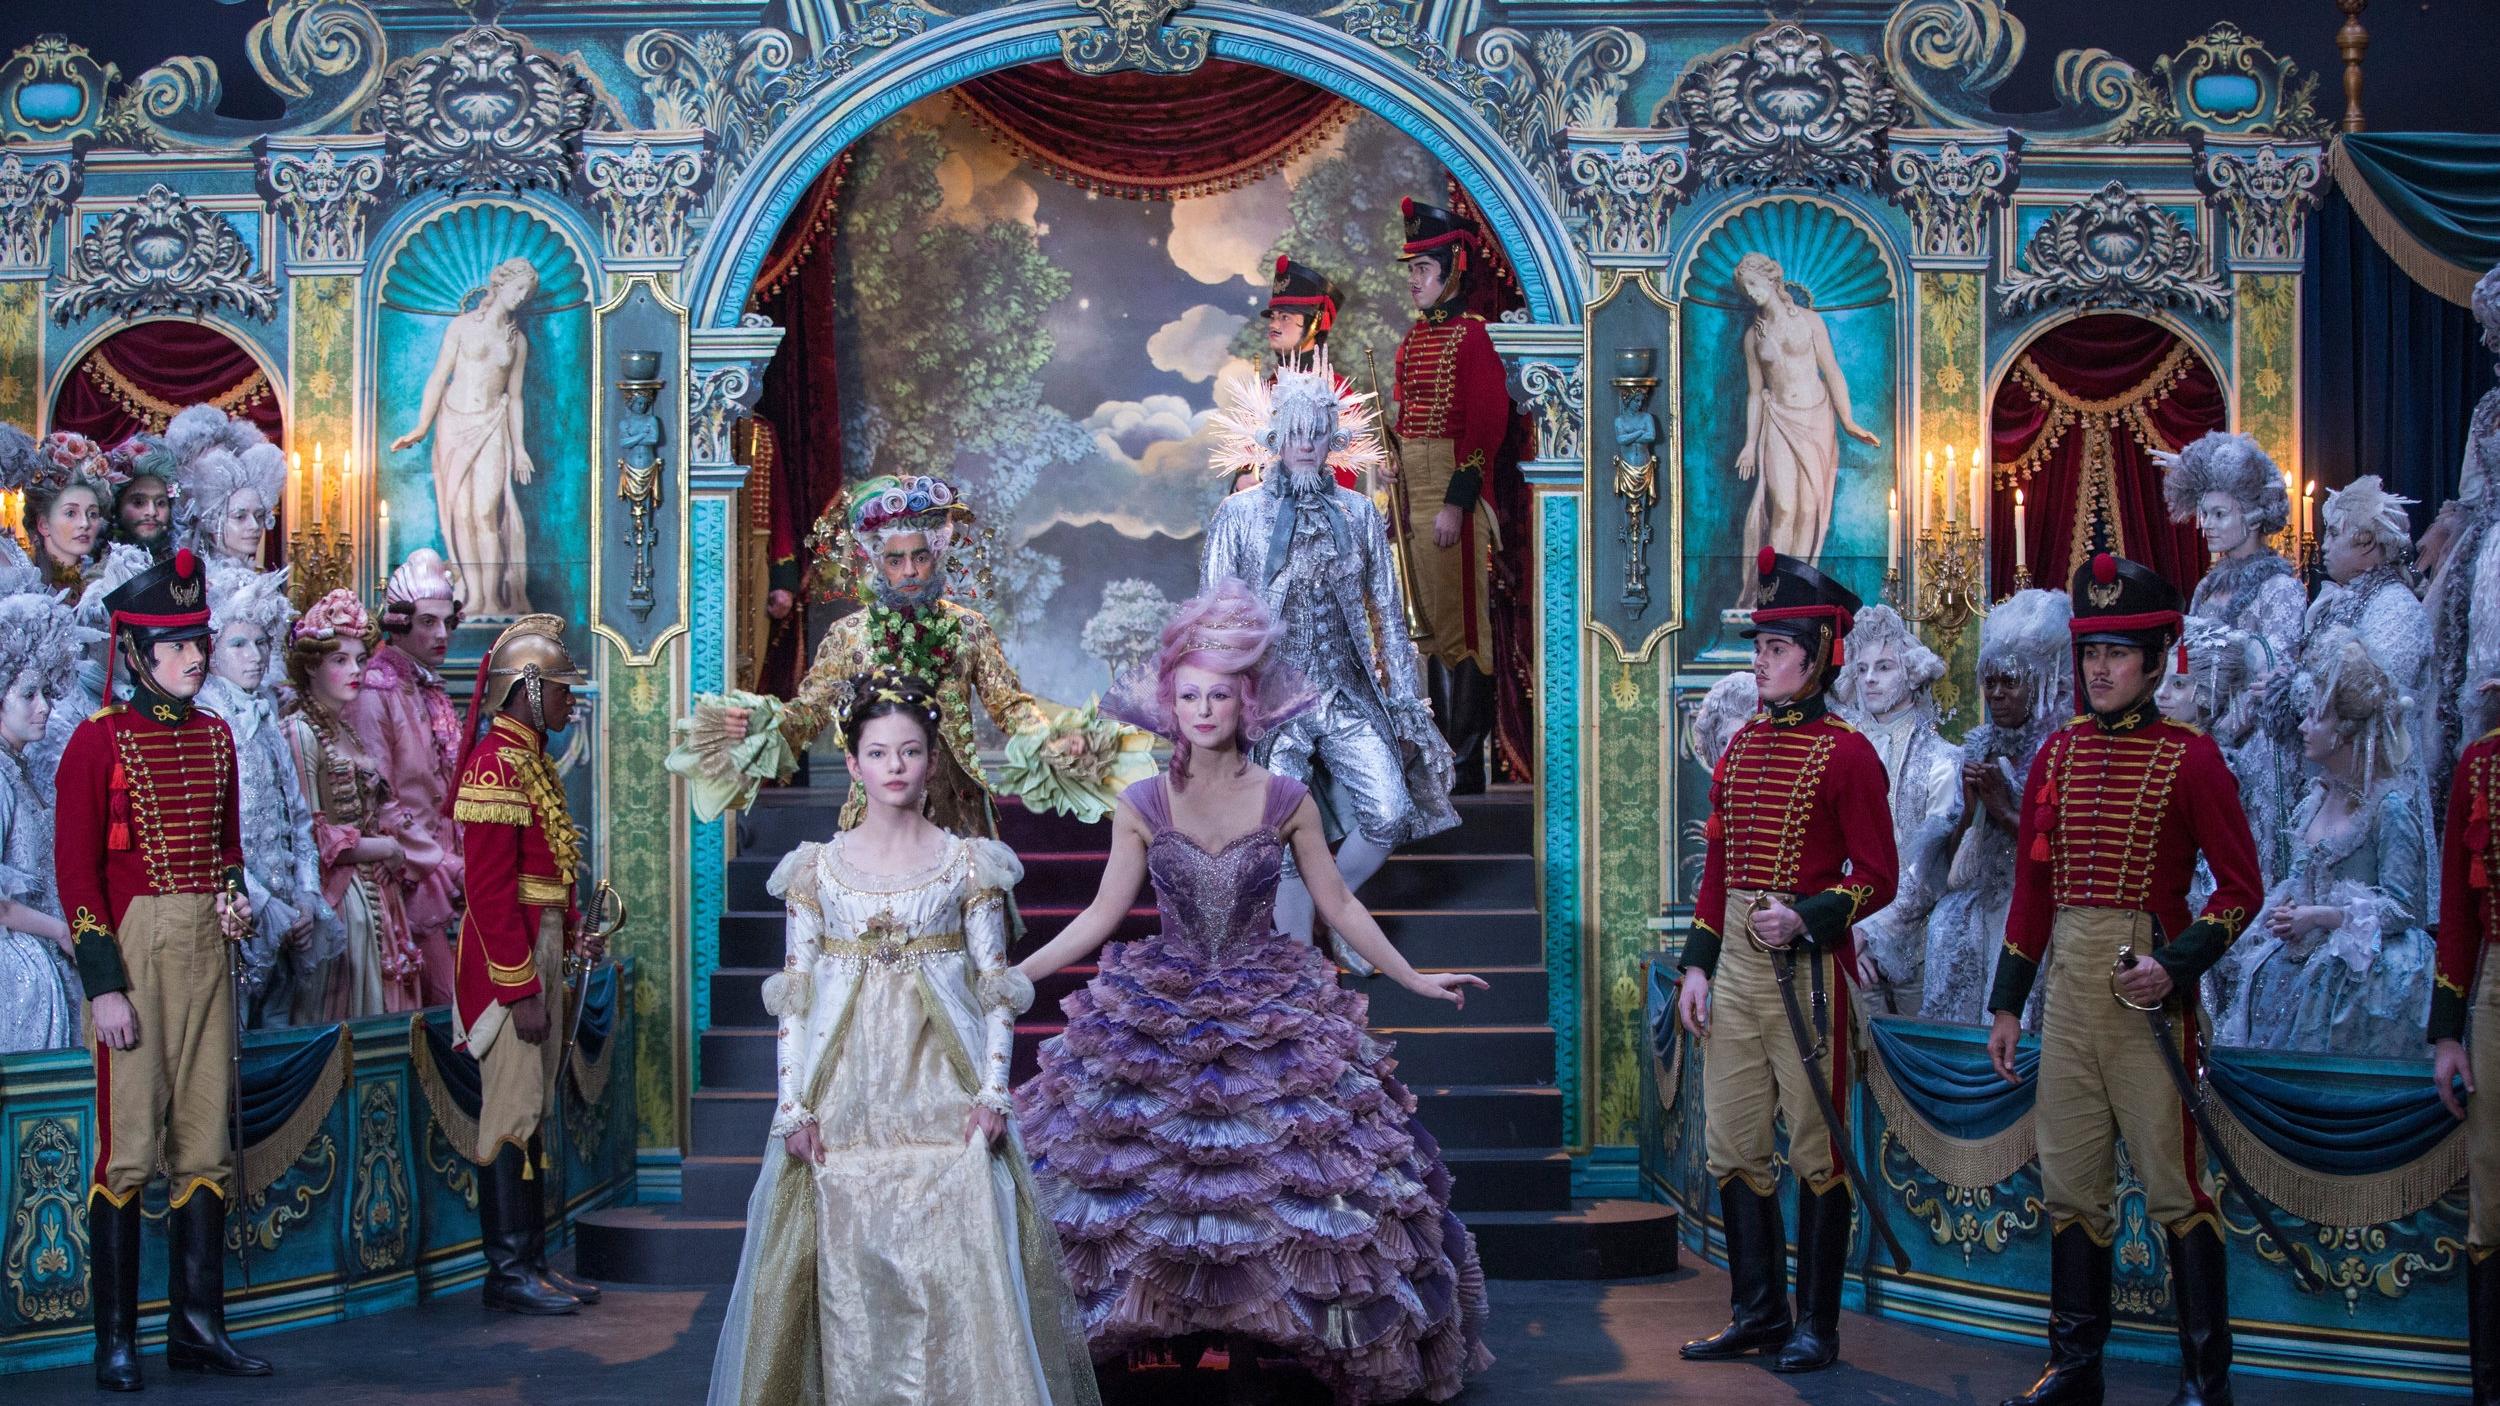 Clara being introduced at a reception by Sugar Plum (Knightley), Hawthorne (Derbez), and Shiver (Grant).